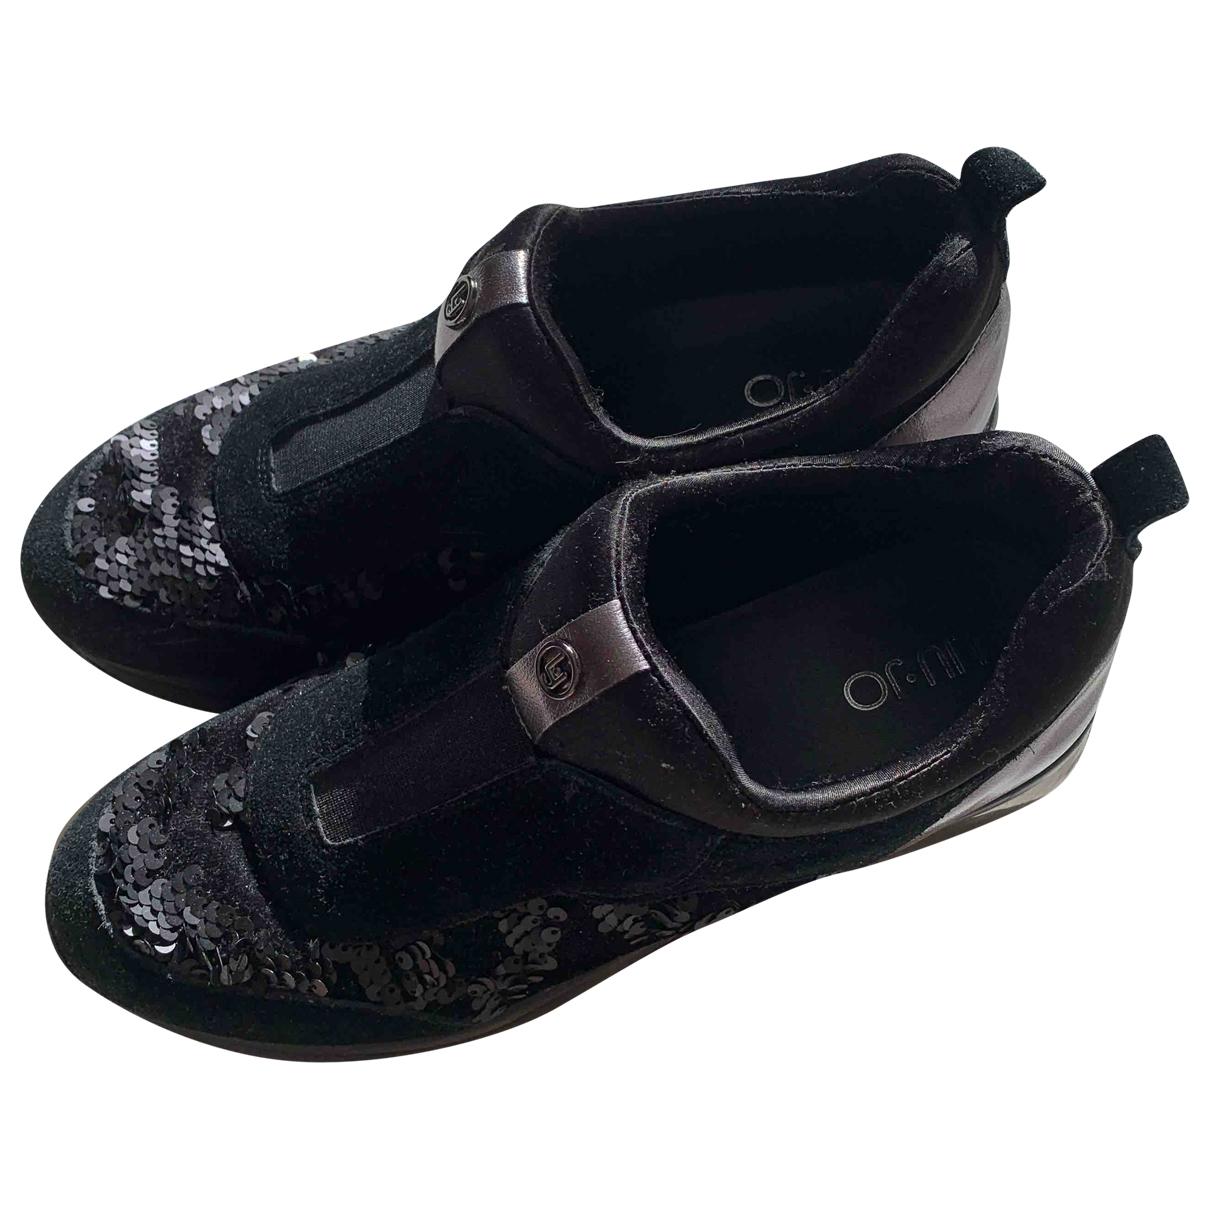 Liu.jo \N Sneakers in  Schwarz Veloursleder